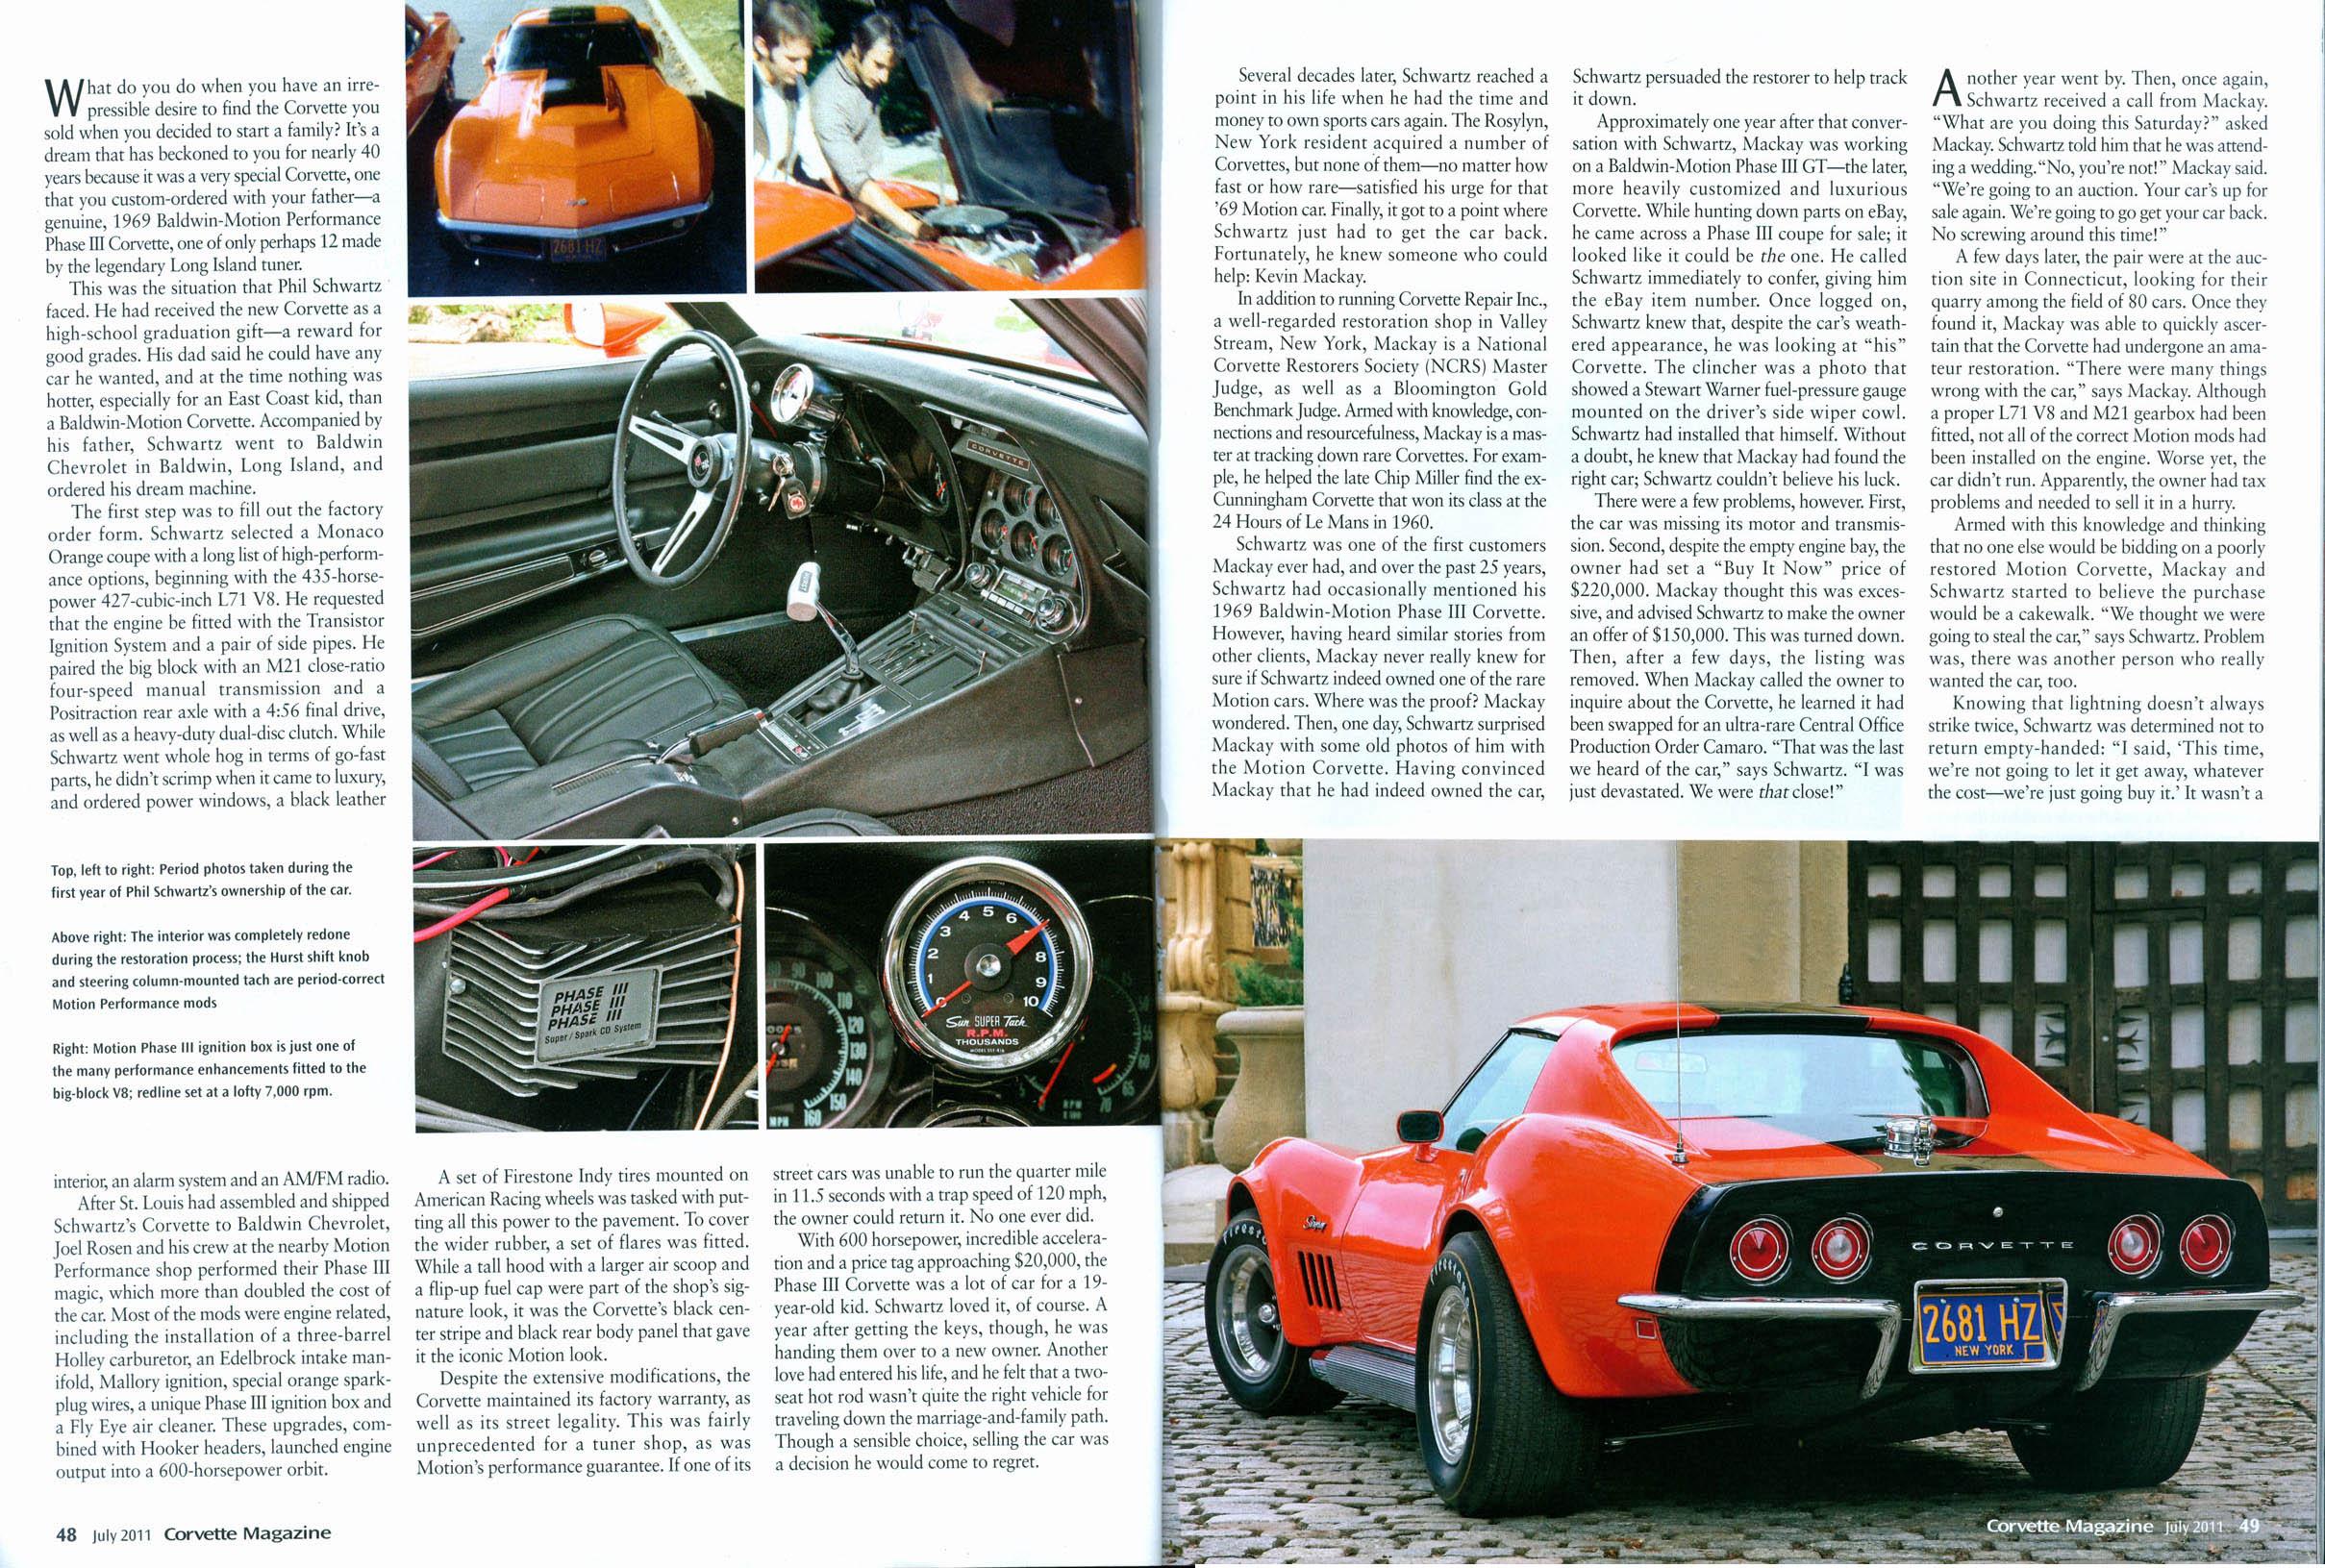 CorvetteMagazineJuly2011_3